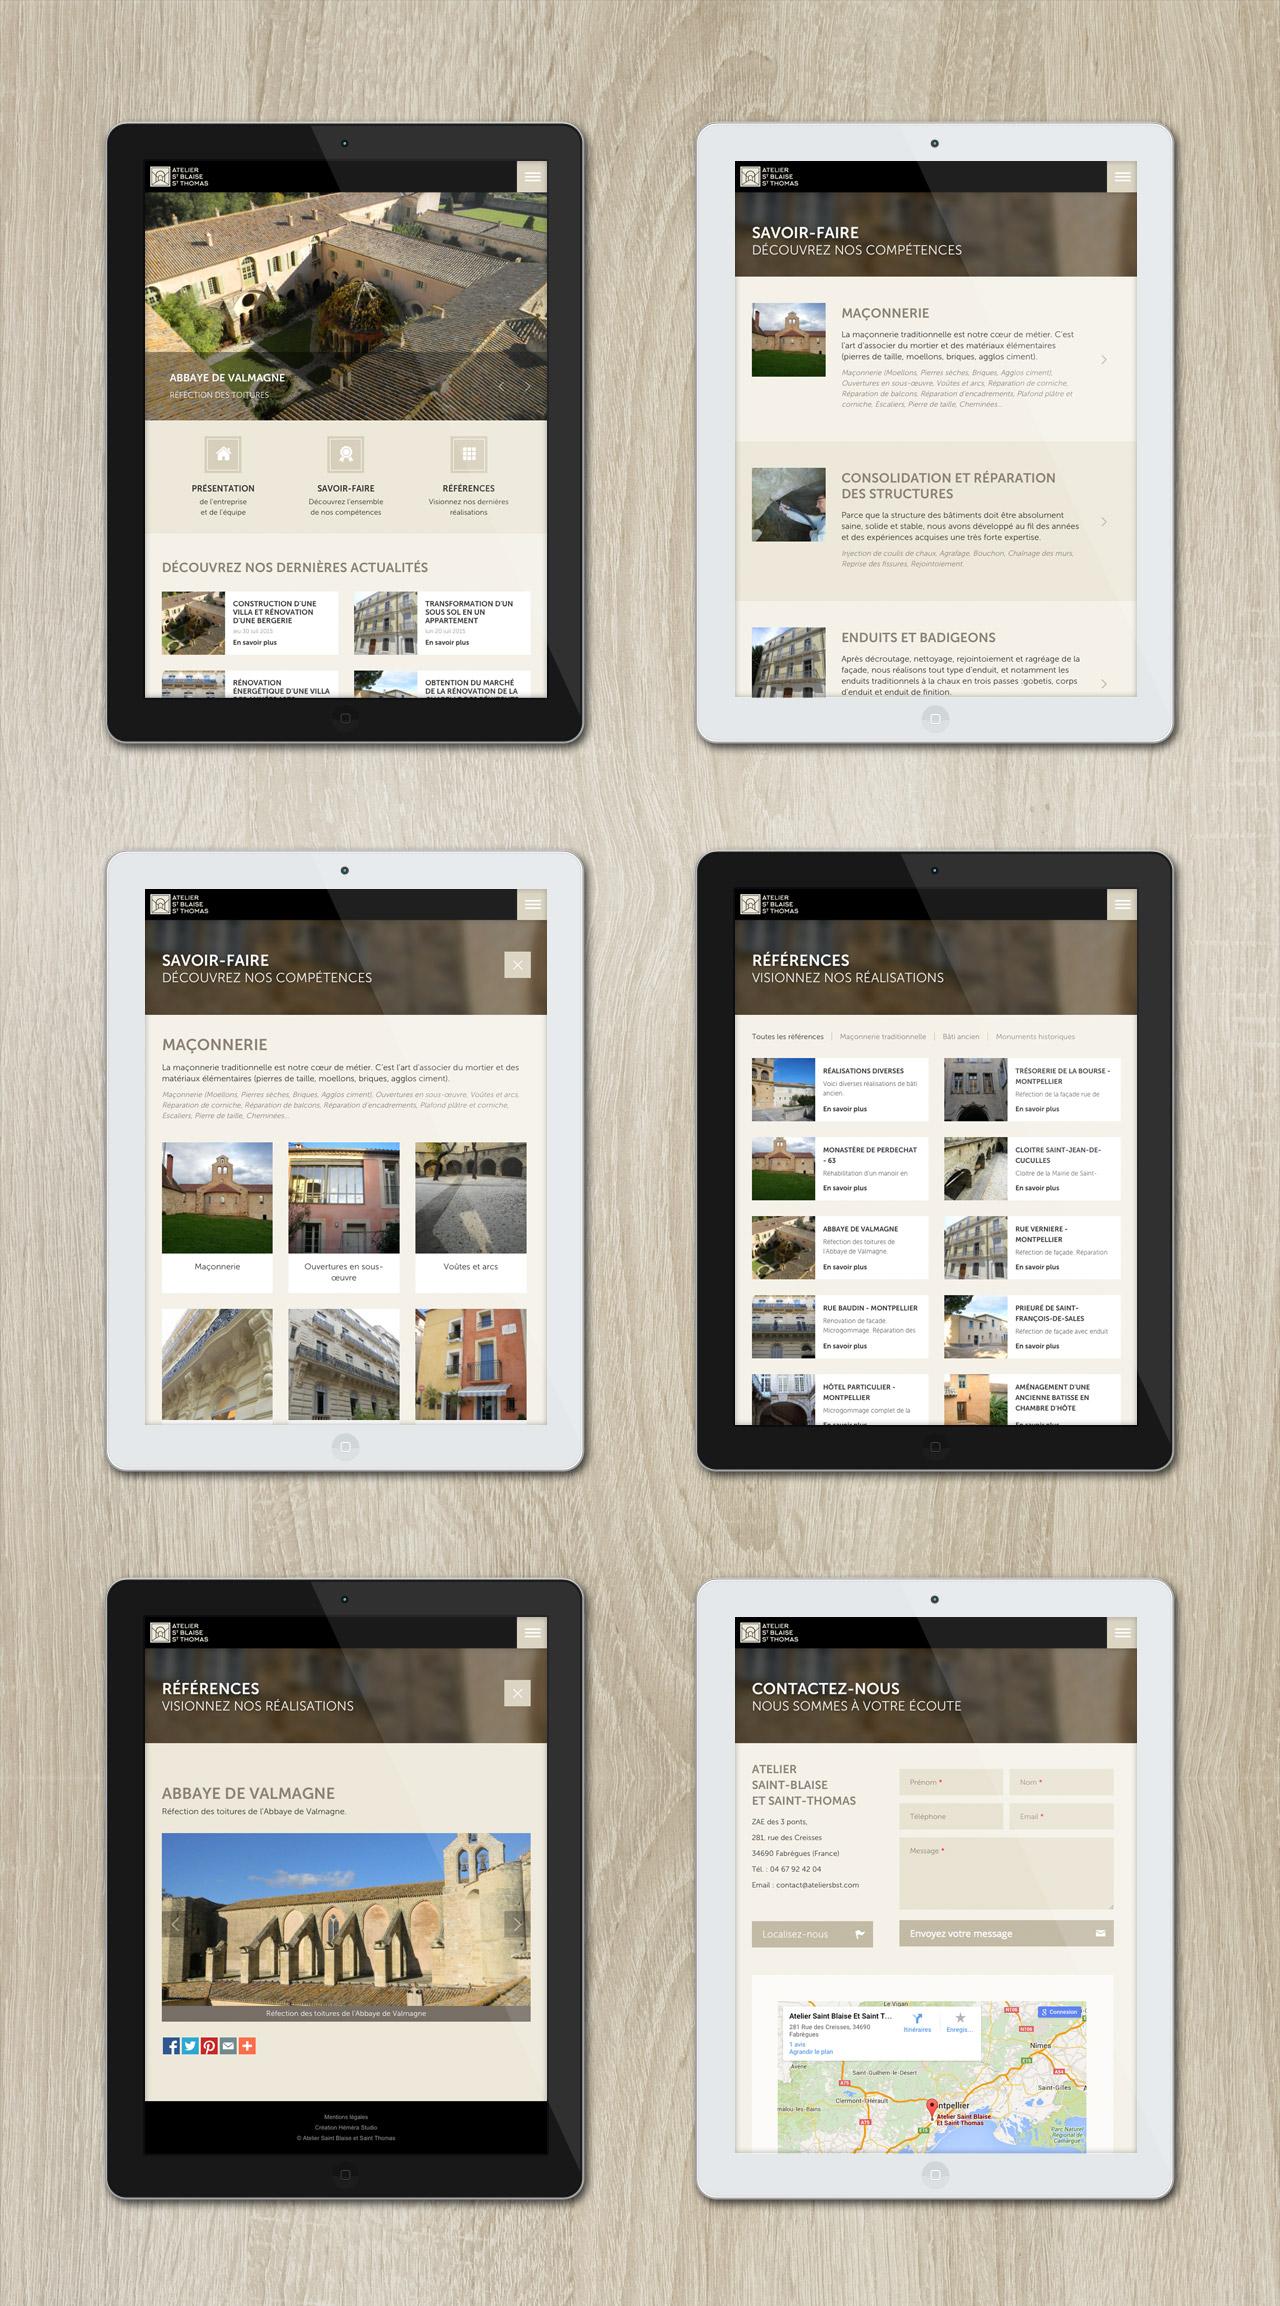 atelier-sbst-creation-site-responsive-design-tablette-communication-hemerastudio-alexis-cretin-graphiste